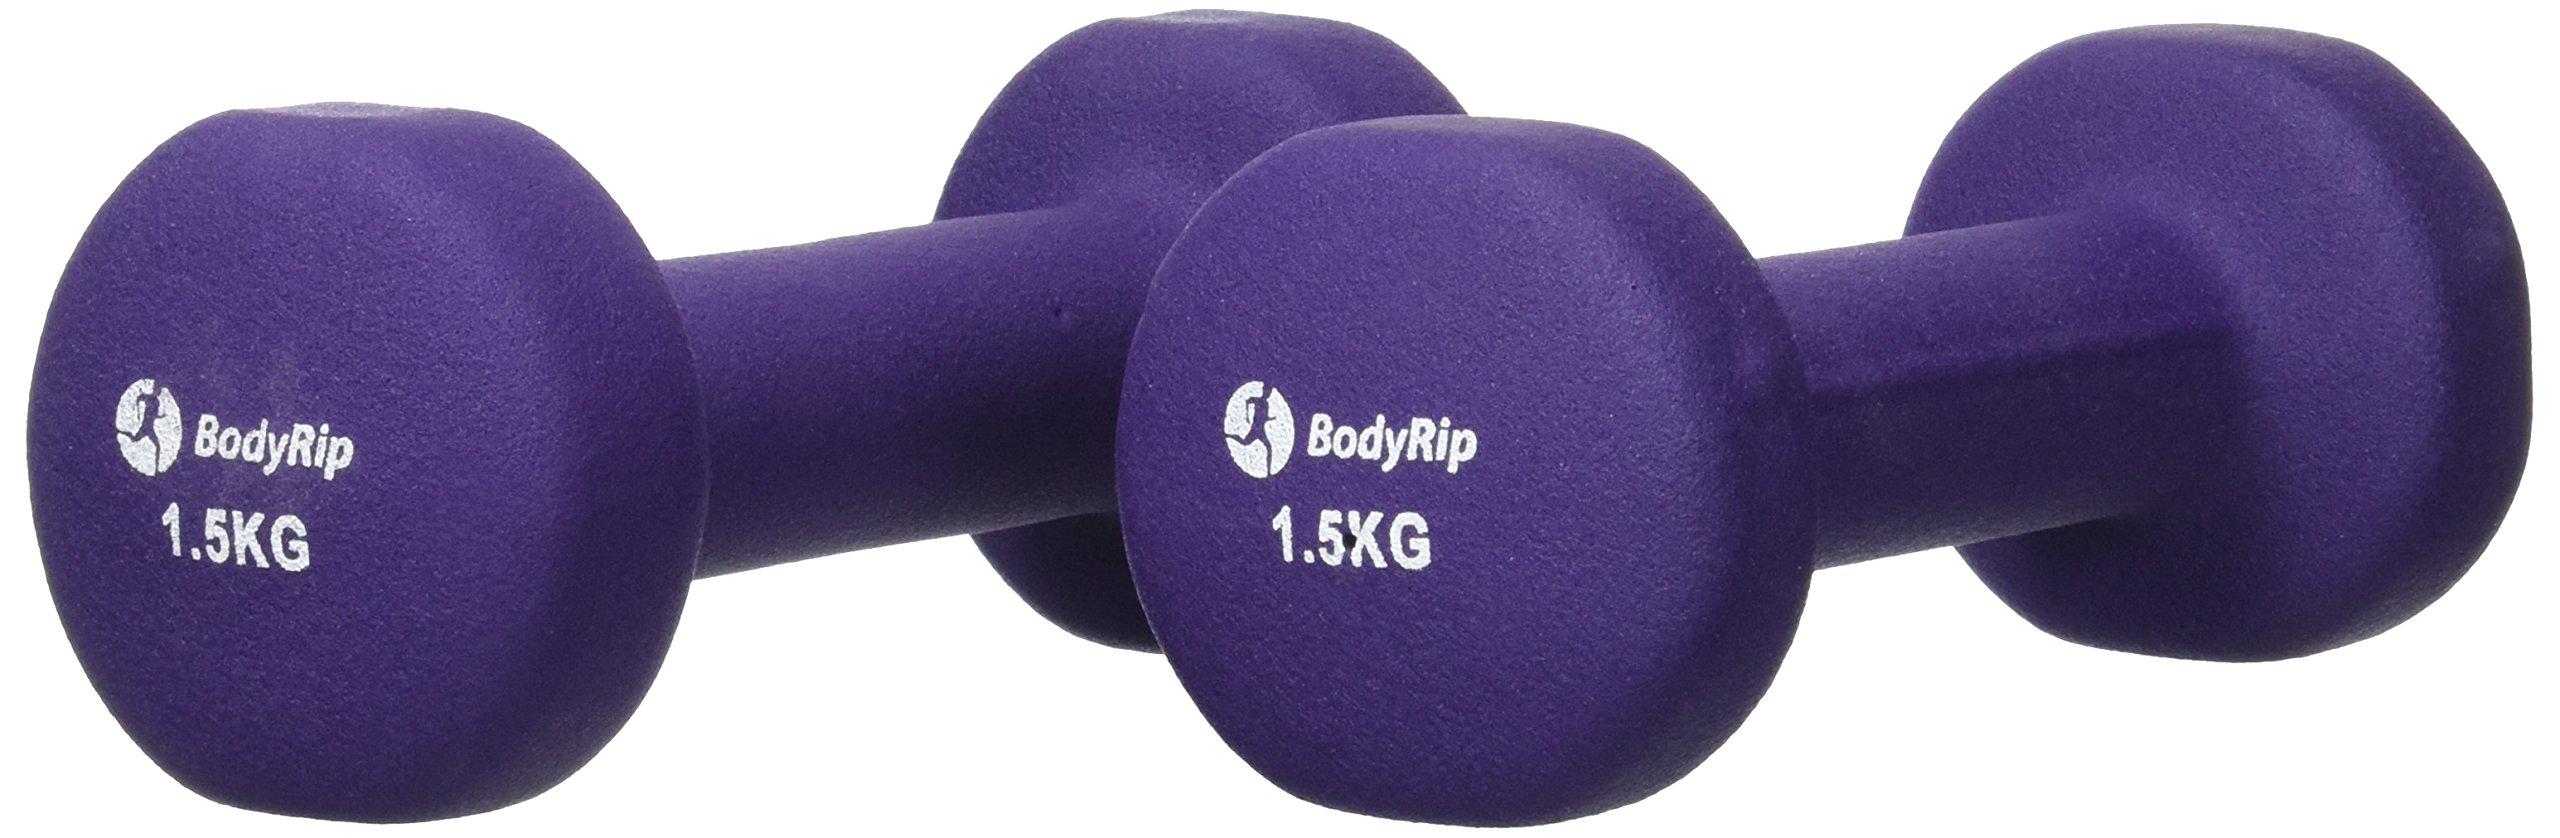 BodyRip - Mancuernas (Neopreno, 2 x 1,5 kg) product image